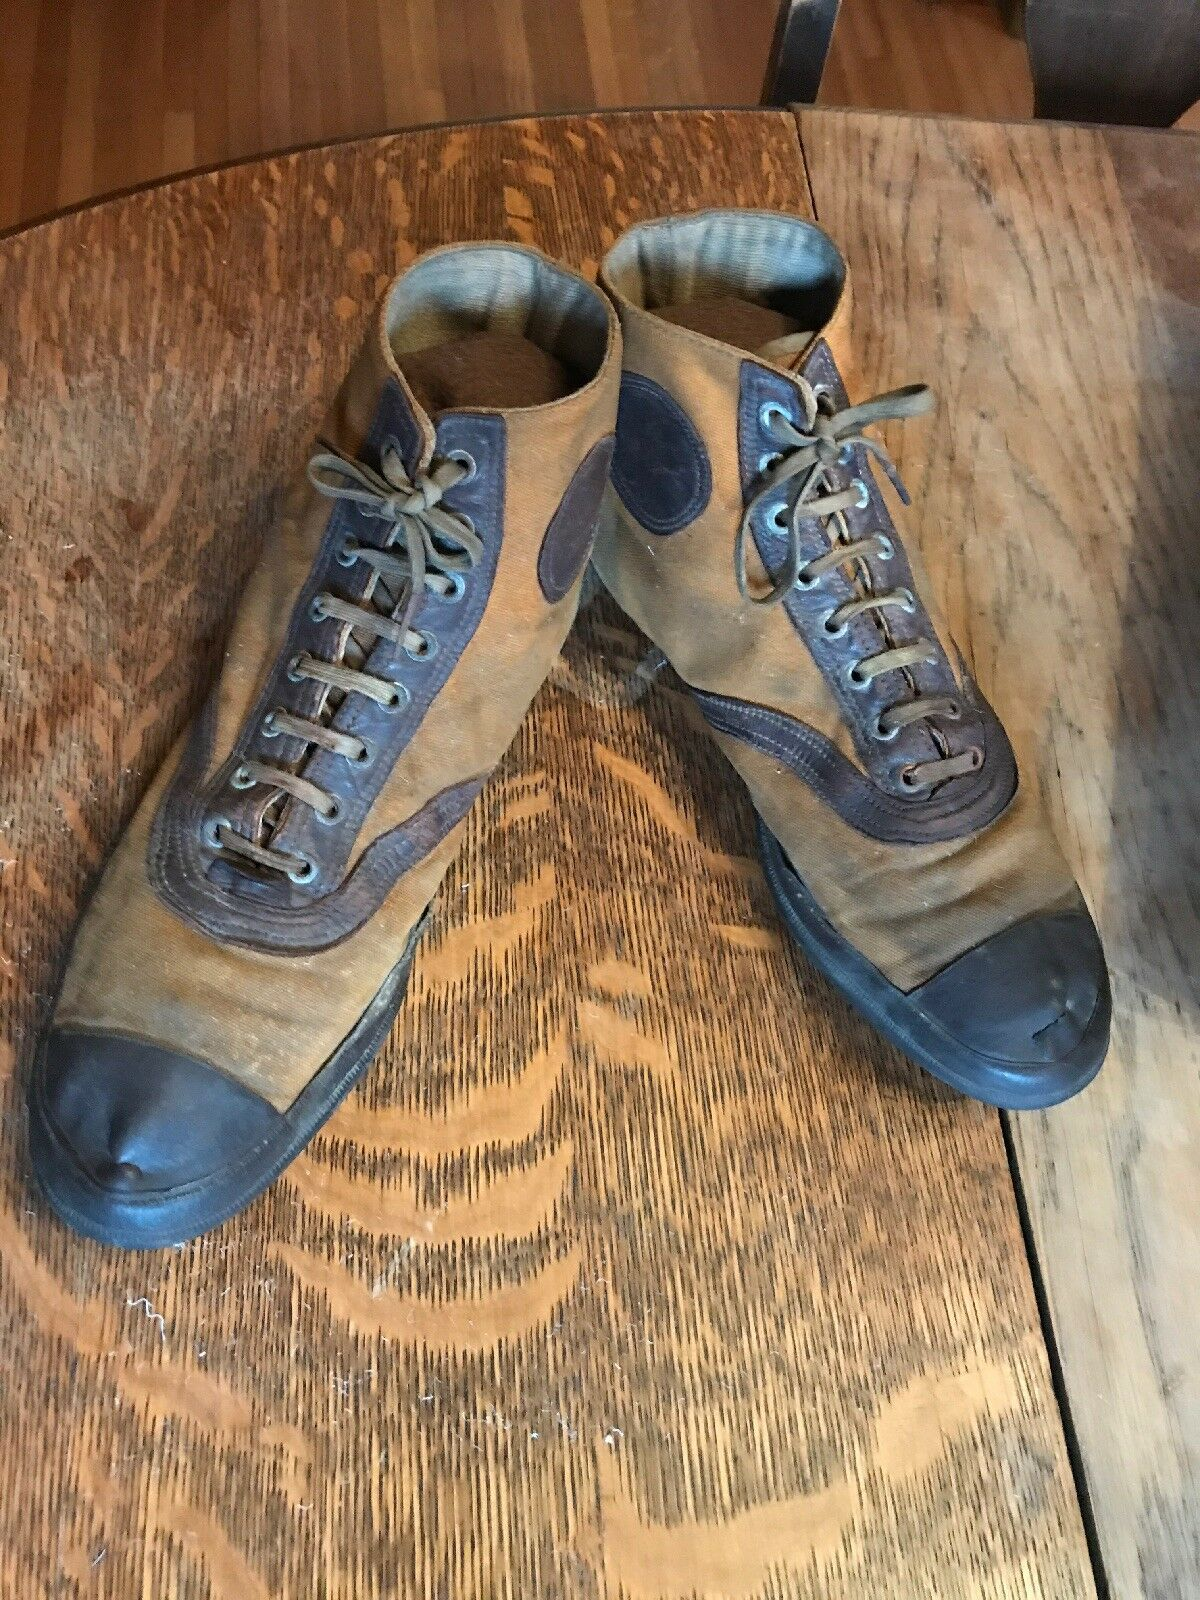 '20 antiguos Lawn Tenis Antiguo Vintage Keds Goodyear Guante raqueta zapatos Co